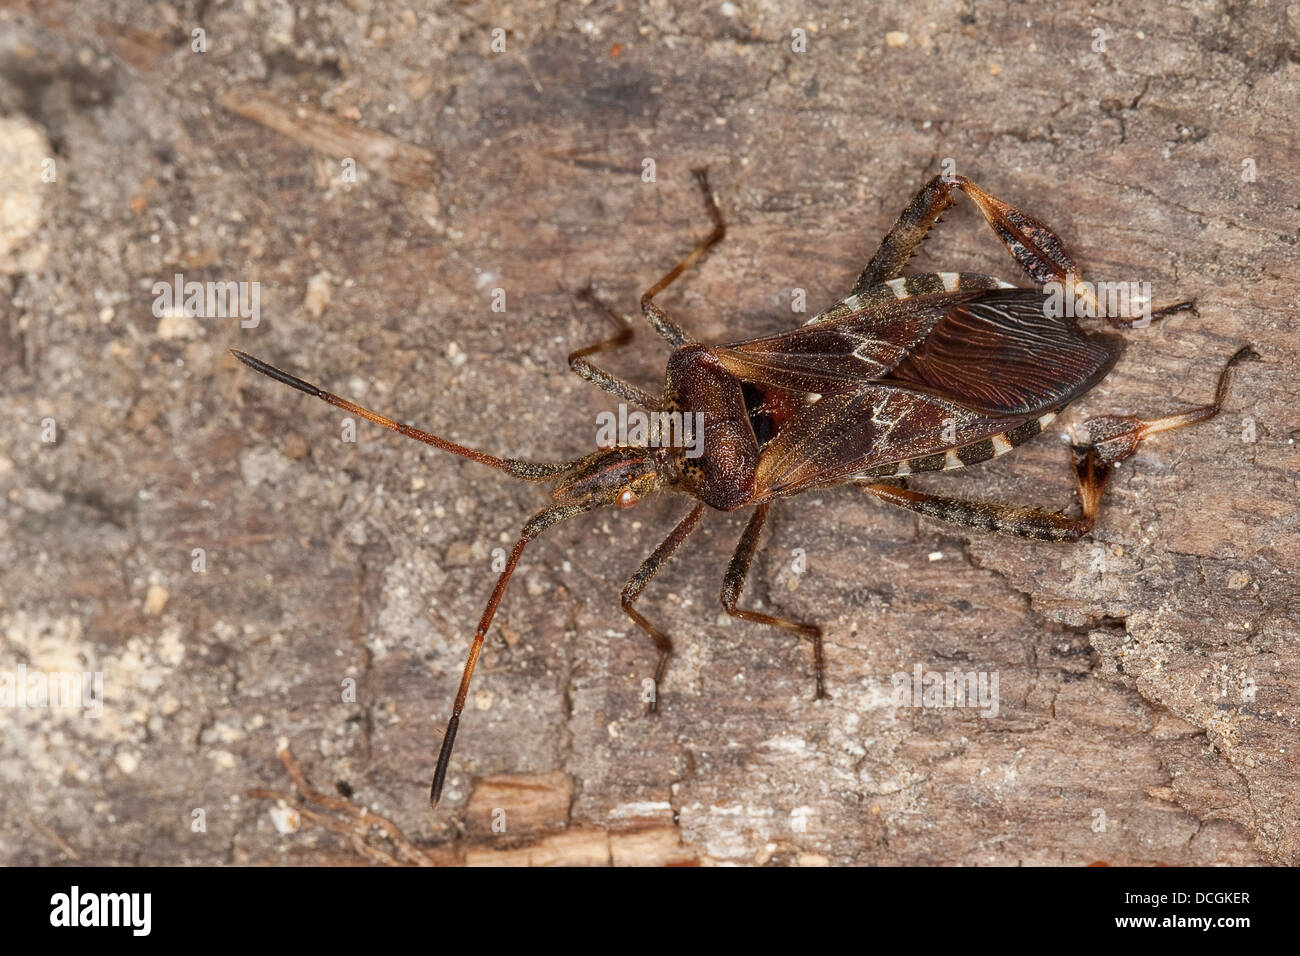 Western conifer seed bug, Amerikanische Kiefernwanze, Amerikanische Zapfenwanze, Leptoglossus occidentalis - Stock Image